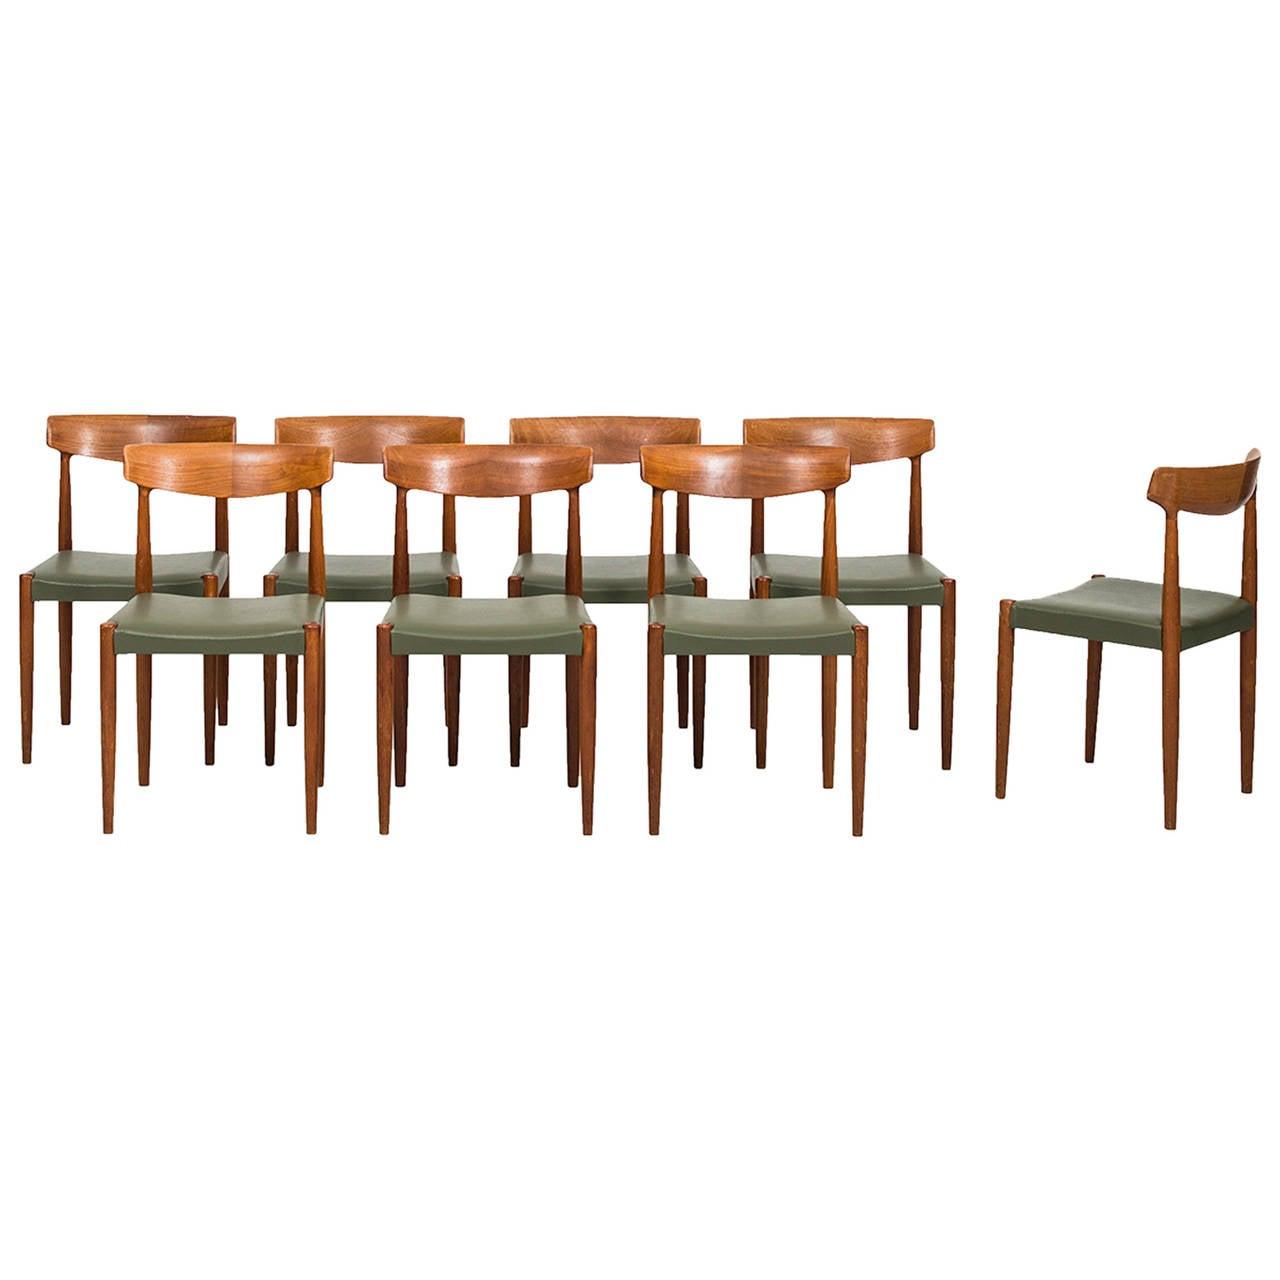 Knud Færch Dining Chairs Model 343 by Slagelse Møbelfabrik in Denmark